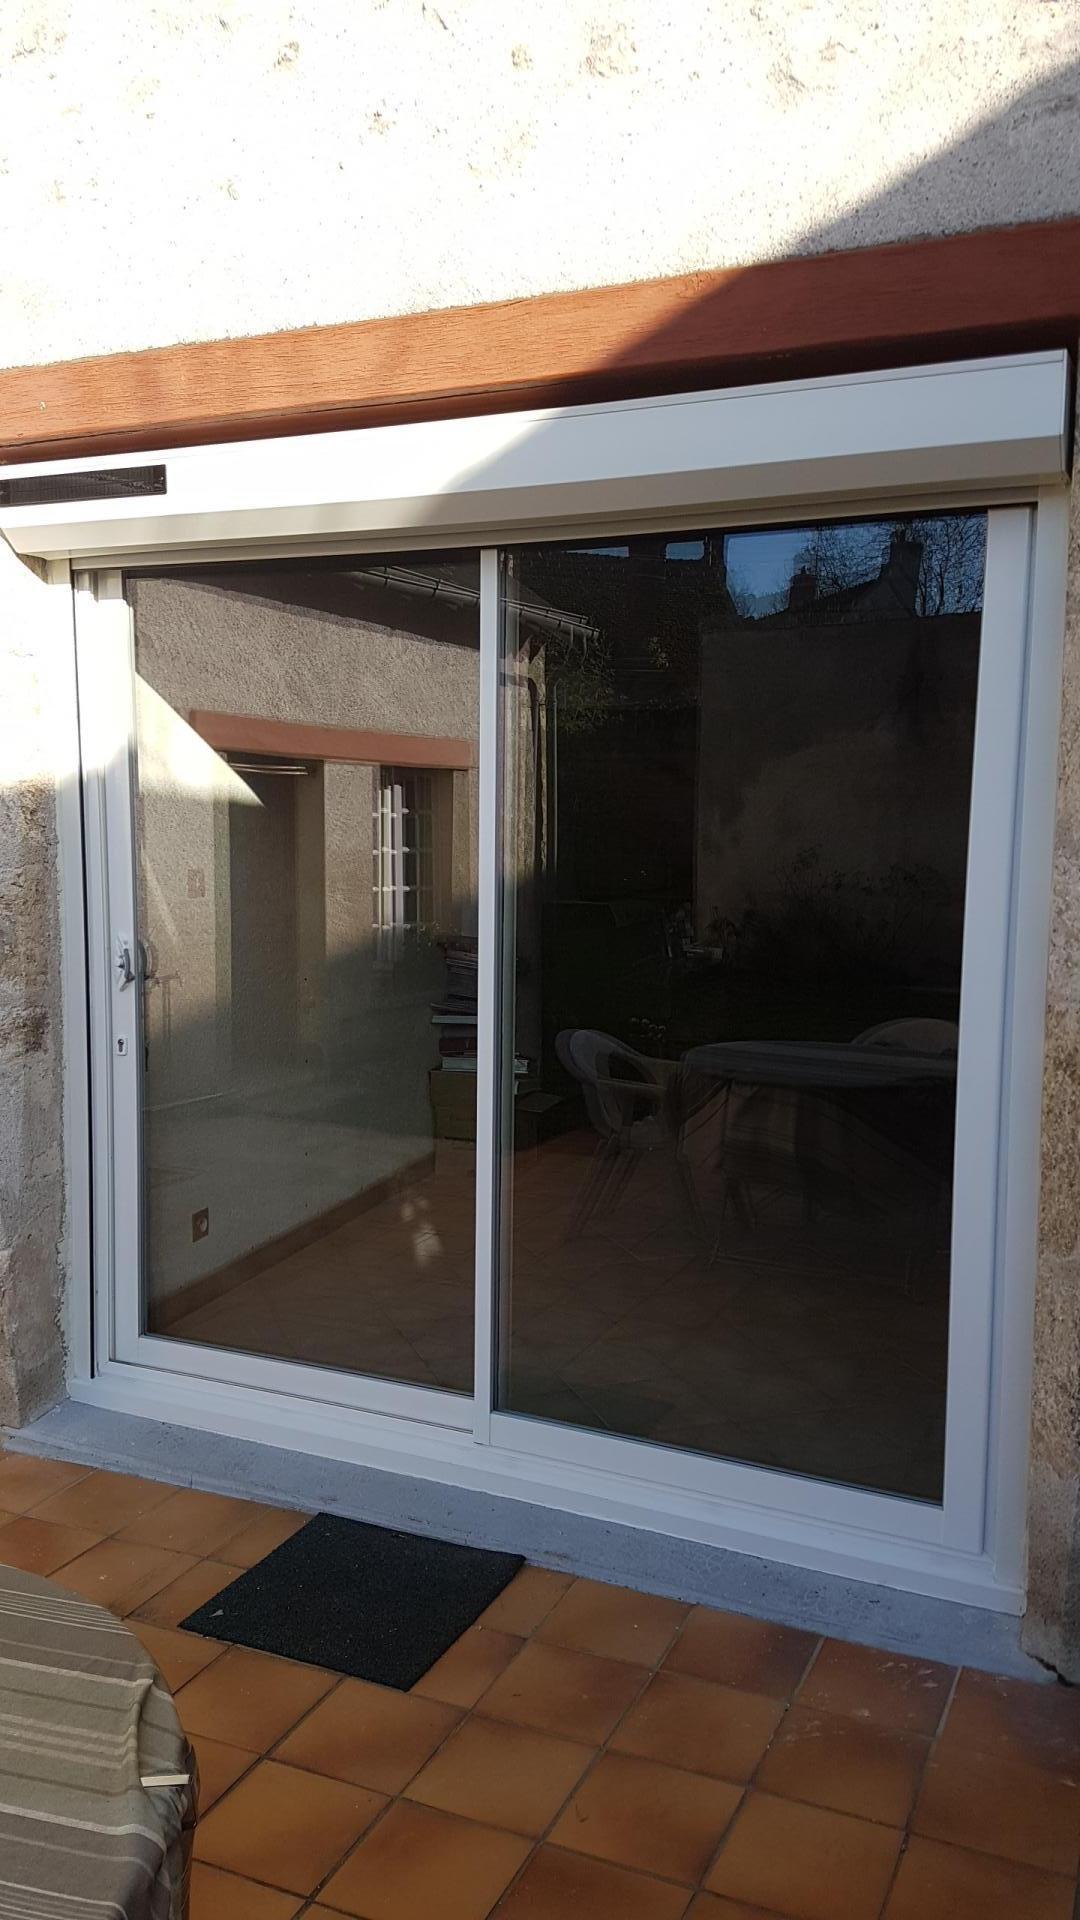 Baie vitree aluminium blanc 2 vtx avec volet roulant solaire